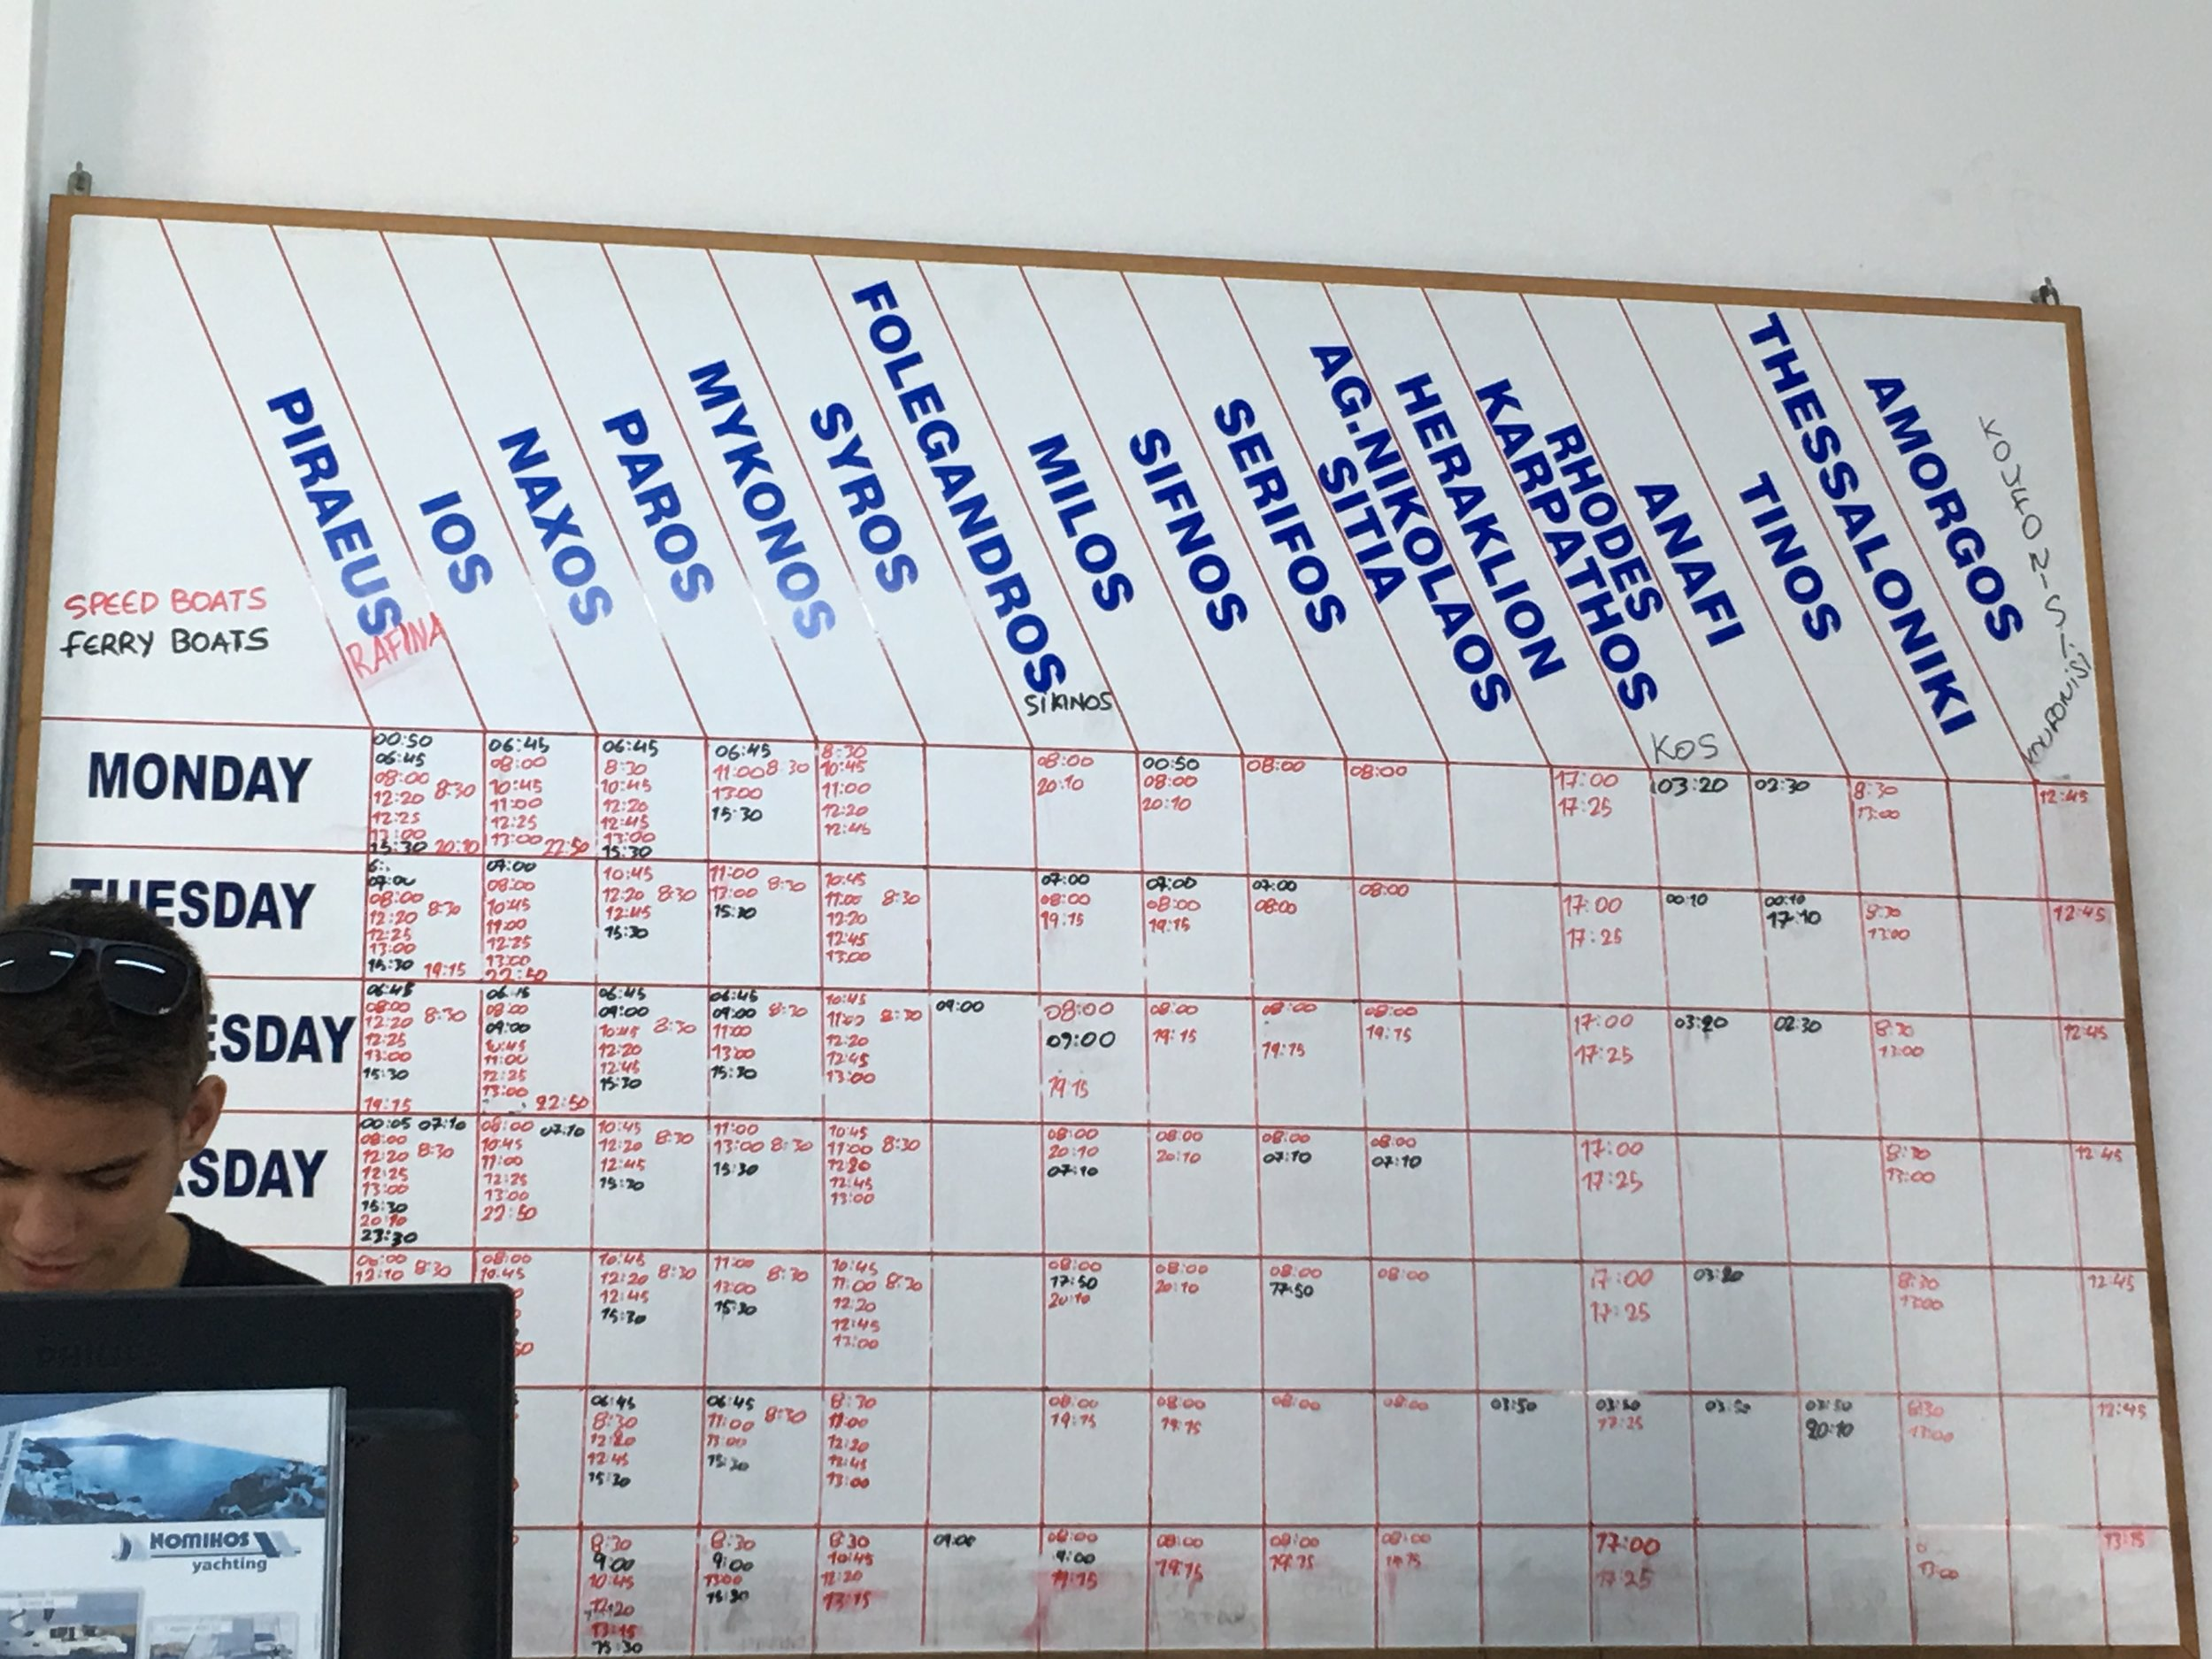 Ferry boat schedule